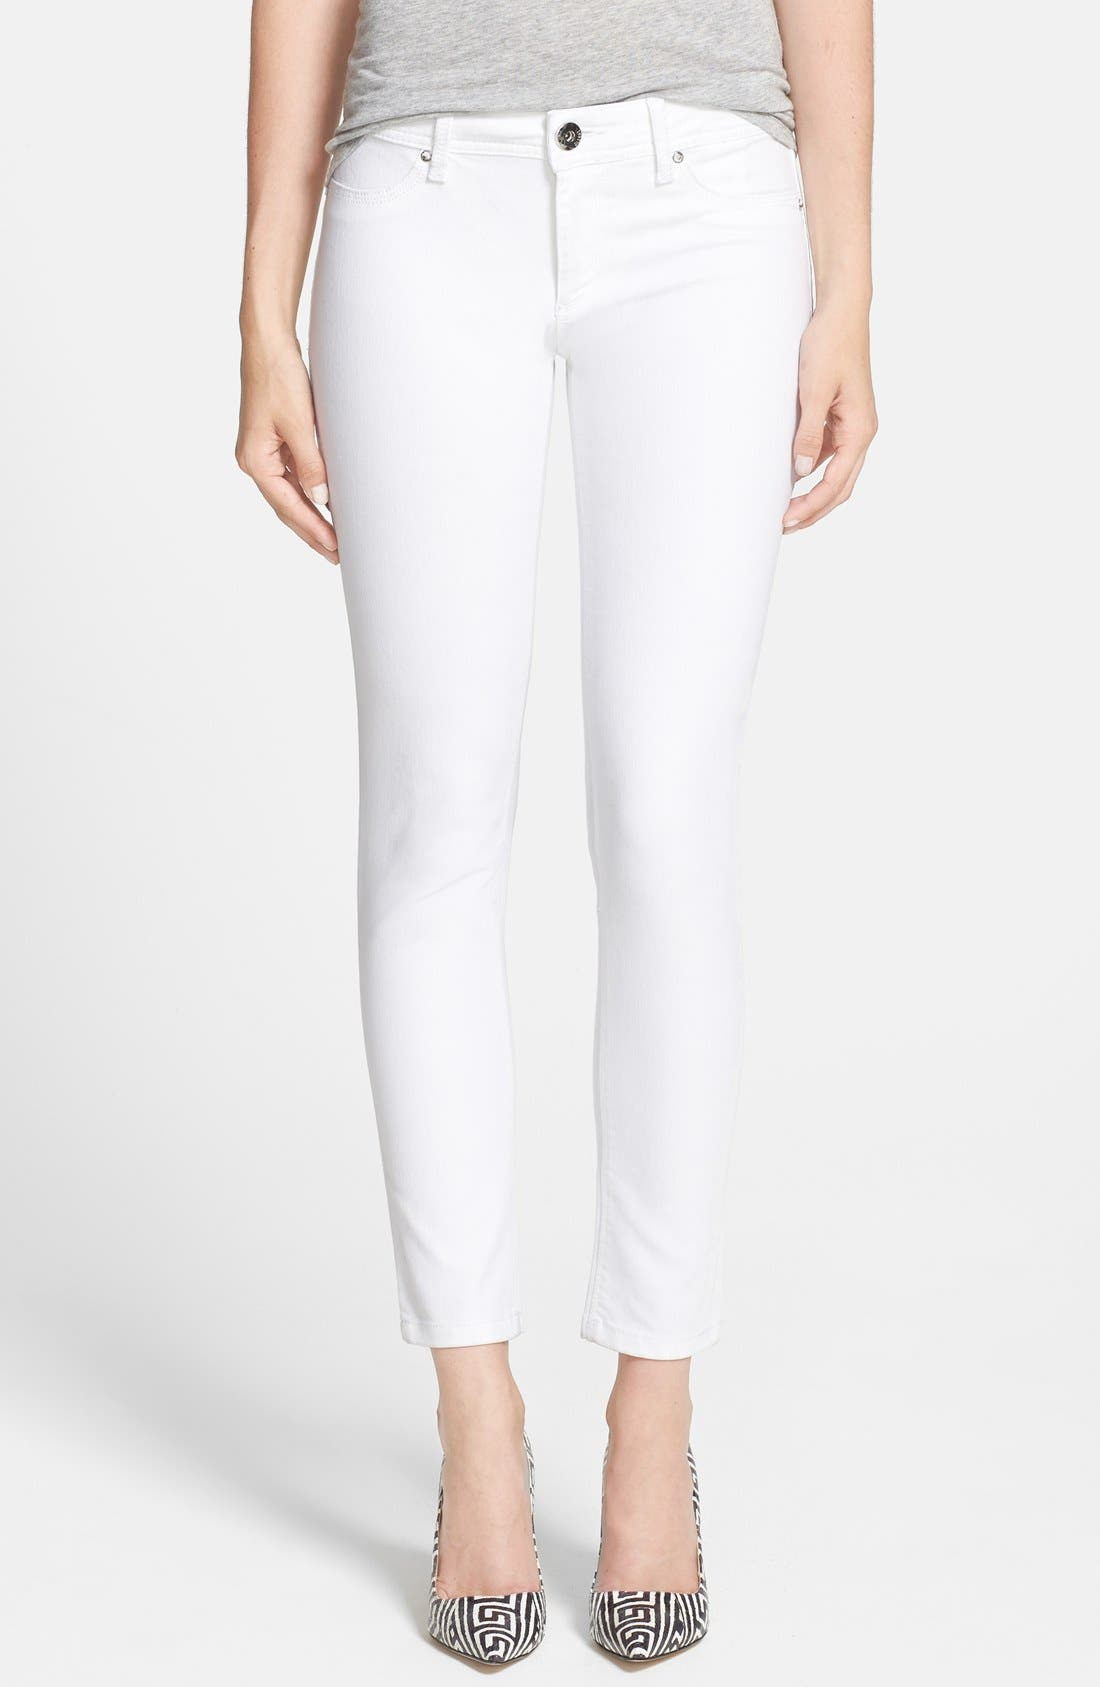 Main Image - DL1961 'Emma' Power Legging Jeans (Milk)